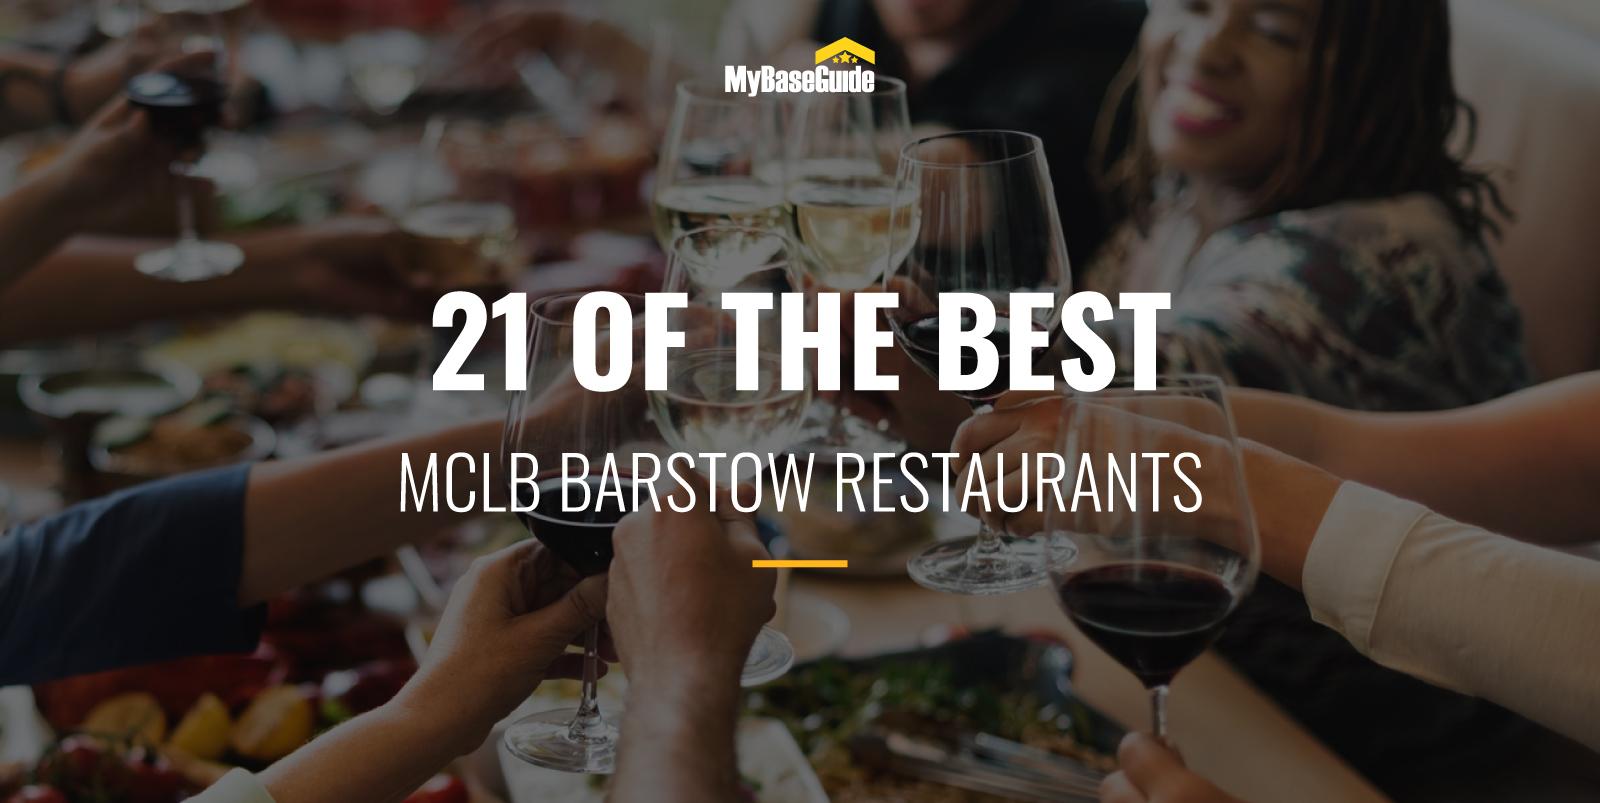 21 of the Best MCLB Barstow Restaurants